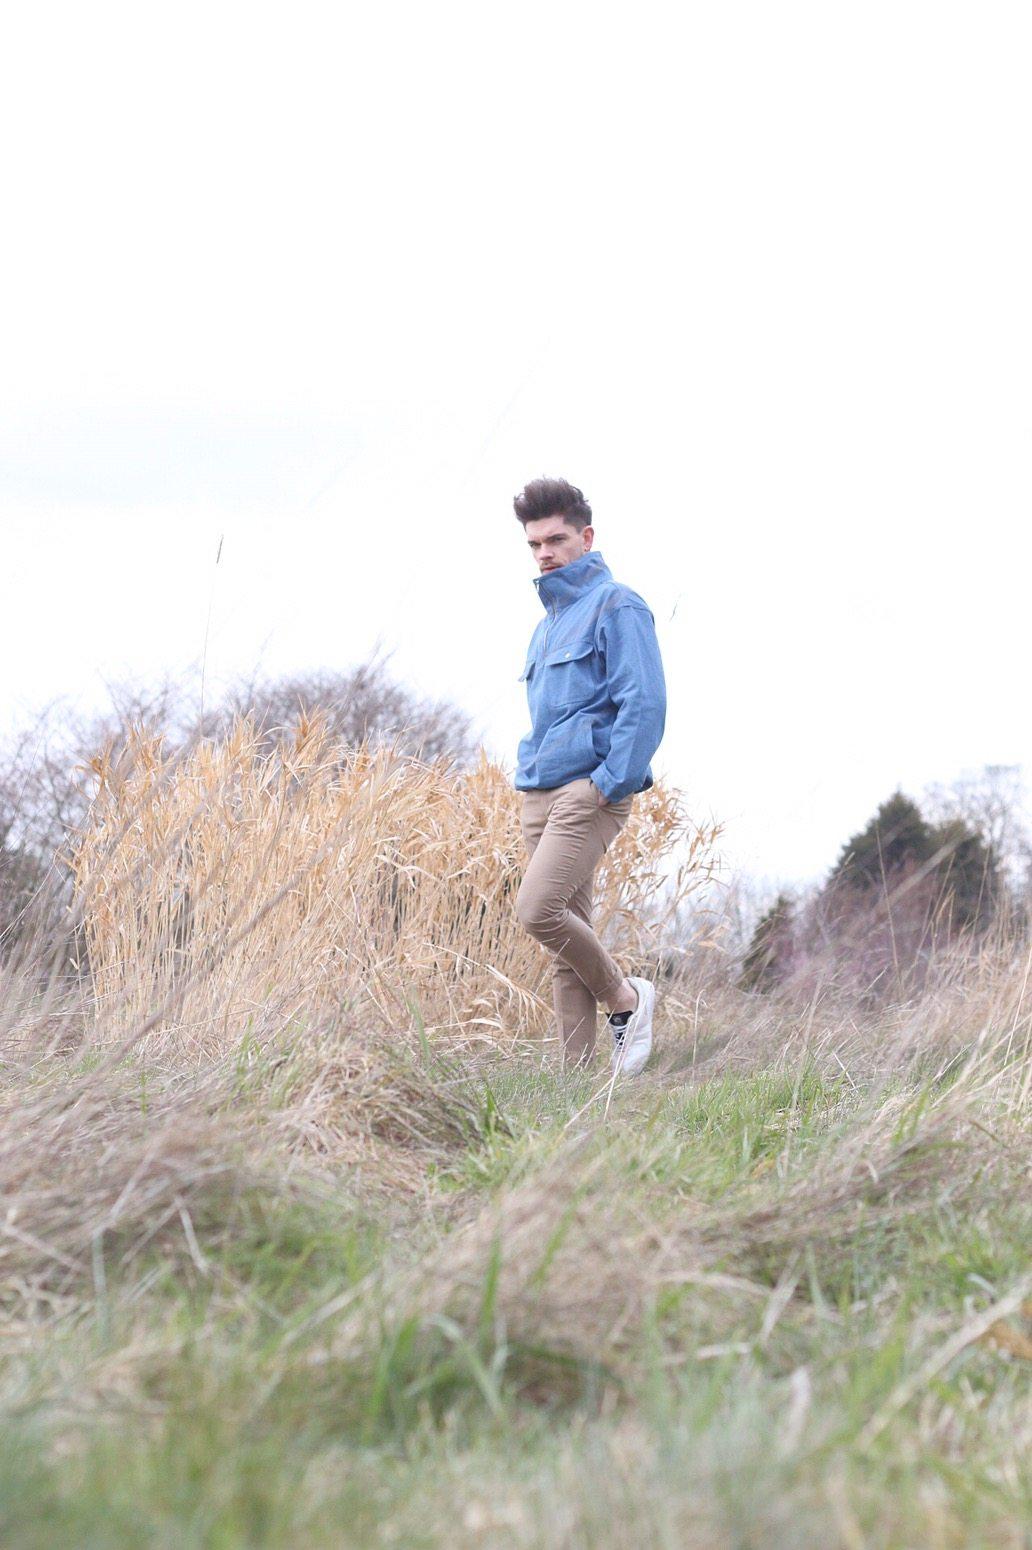 Robin-James-Man-For-Himself-Menswear-Mens-Style-Overhead-Jacket